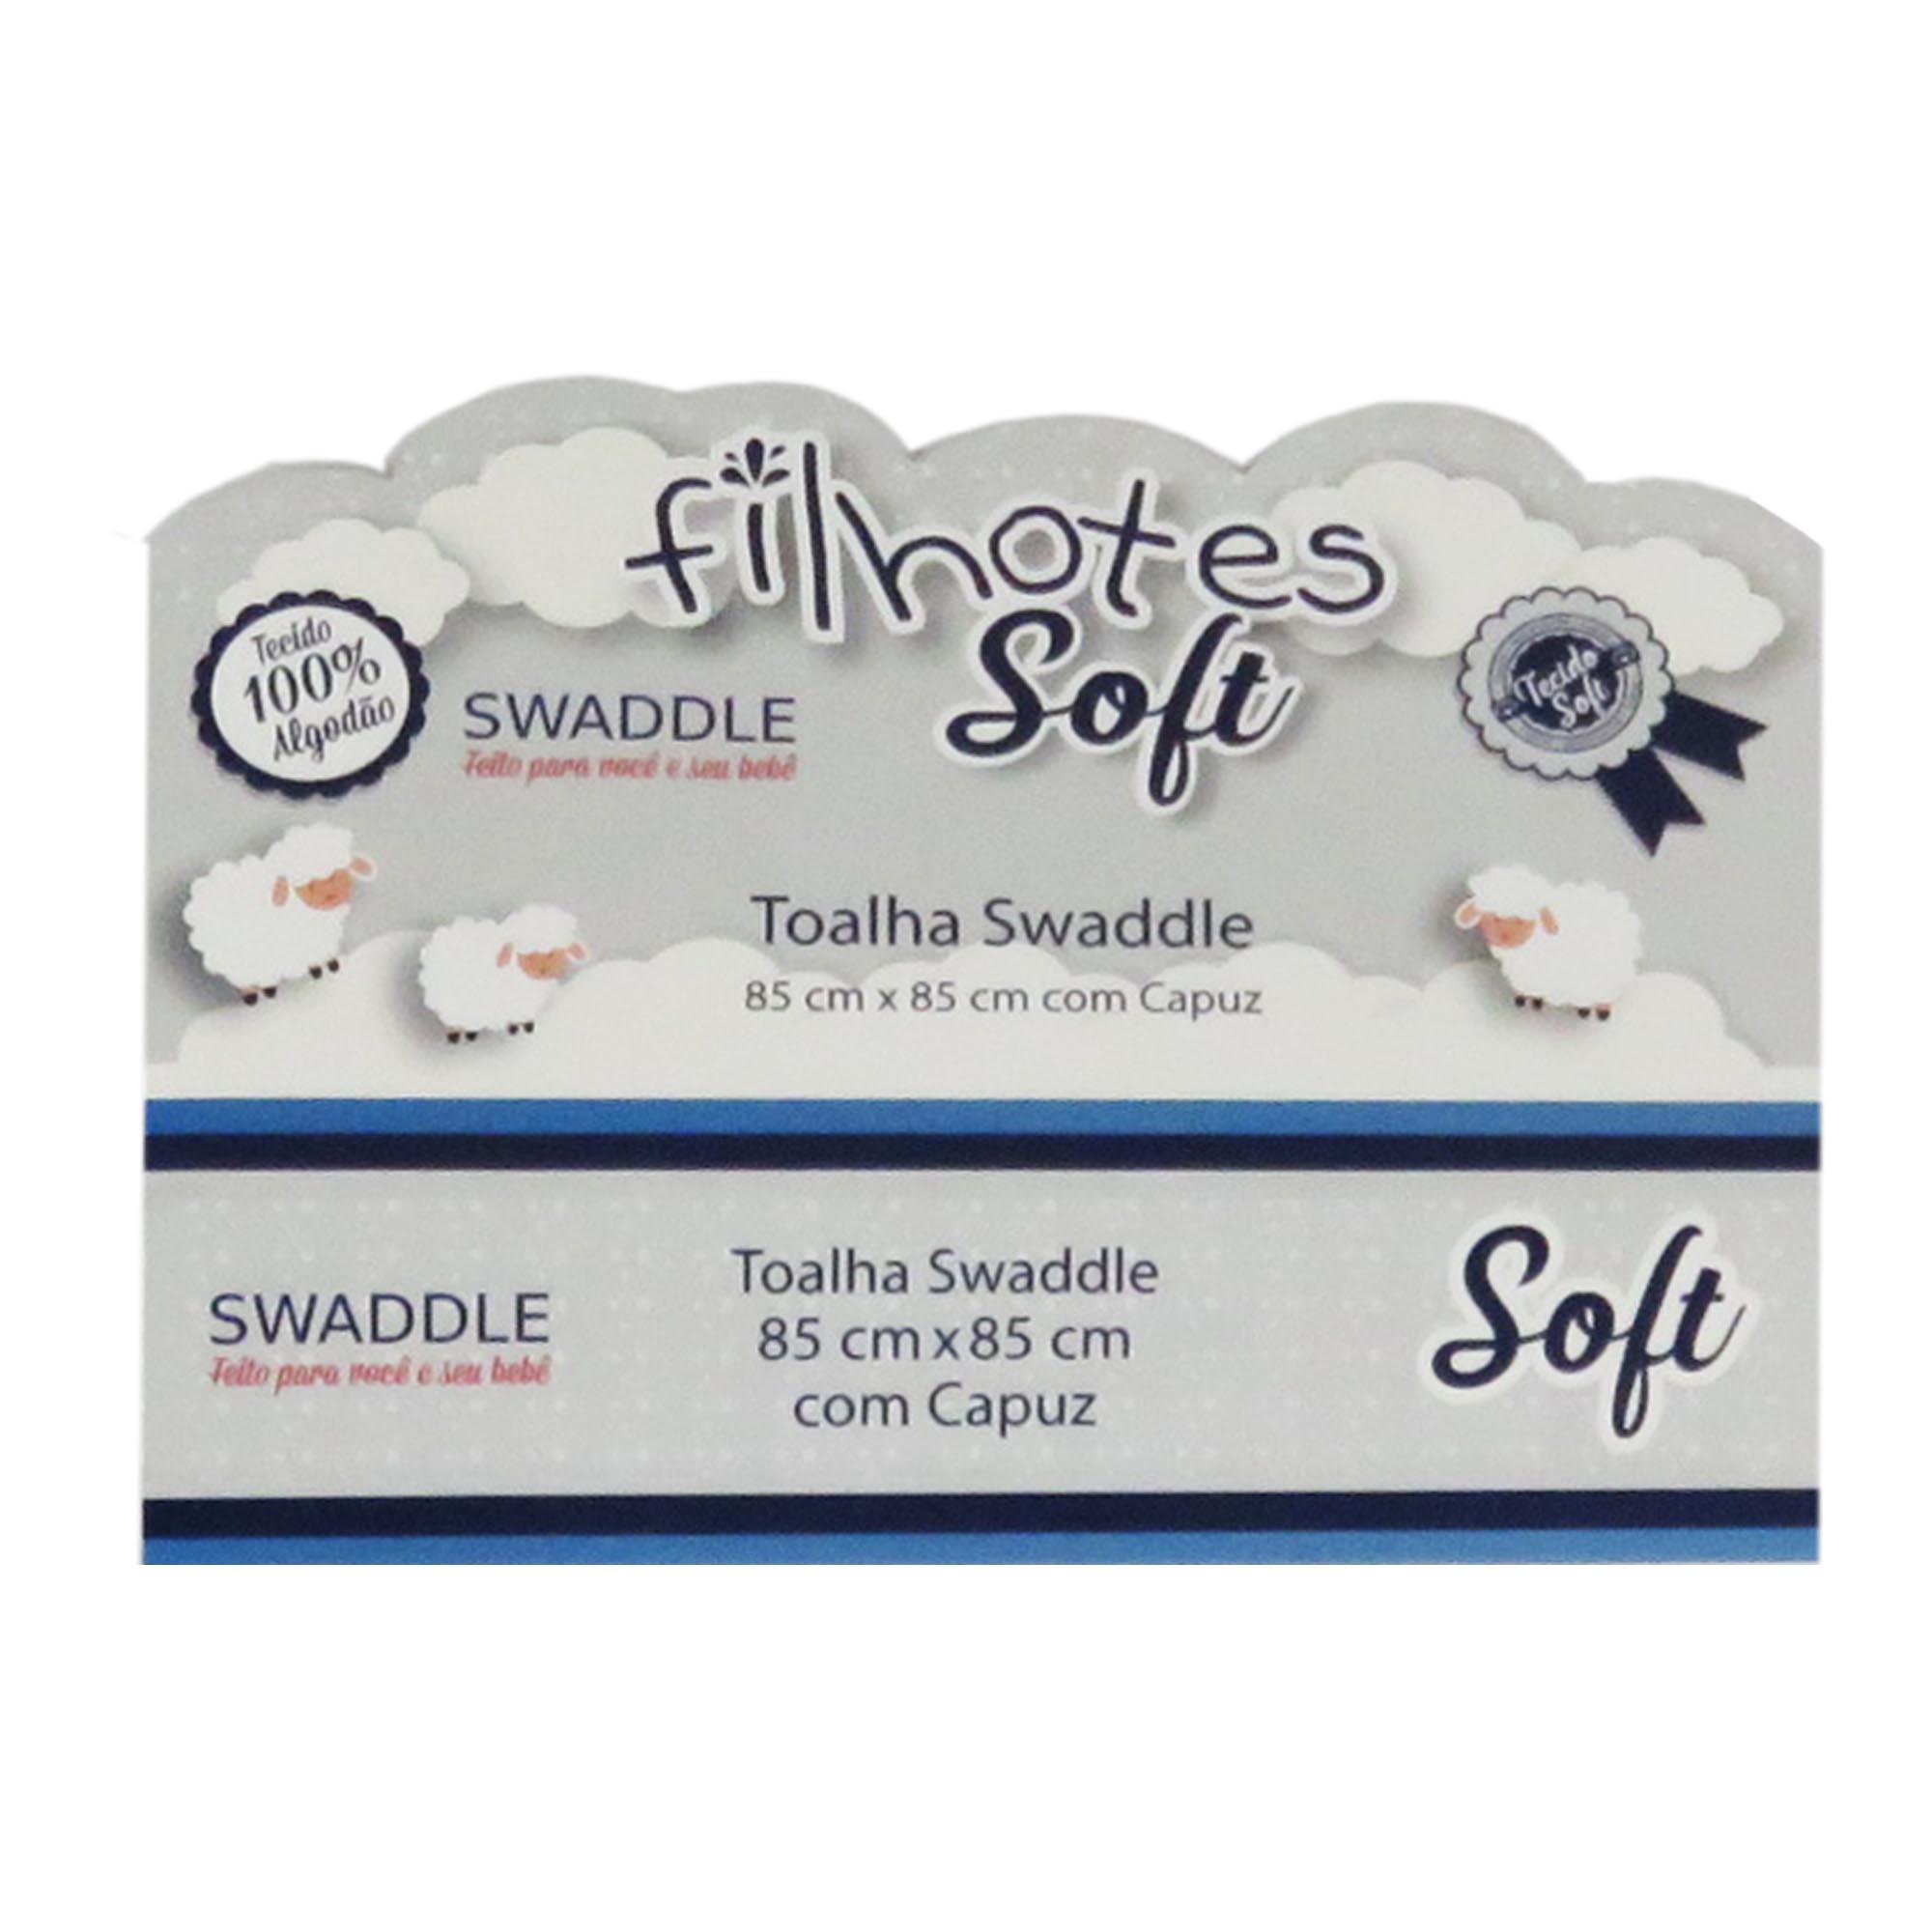 Toalha Swaddle com capuz - Minasrey - Filhotes Soft - Ovelha - Bege